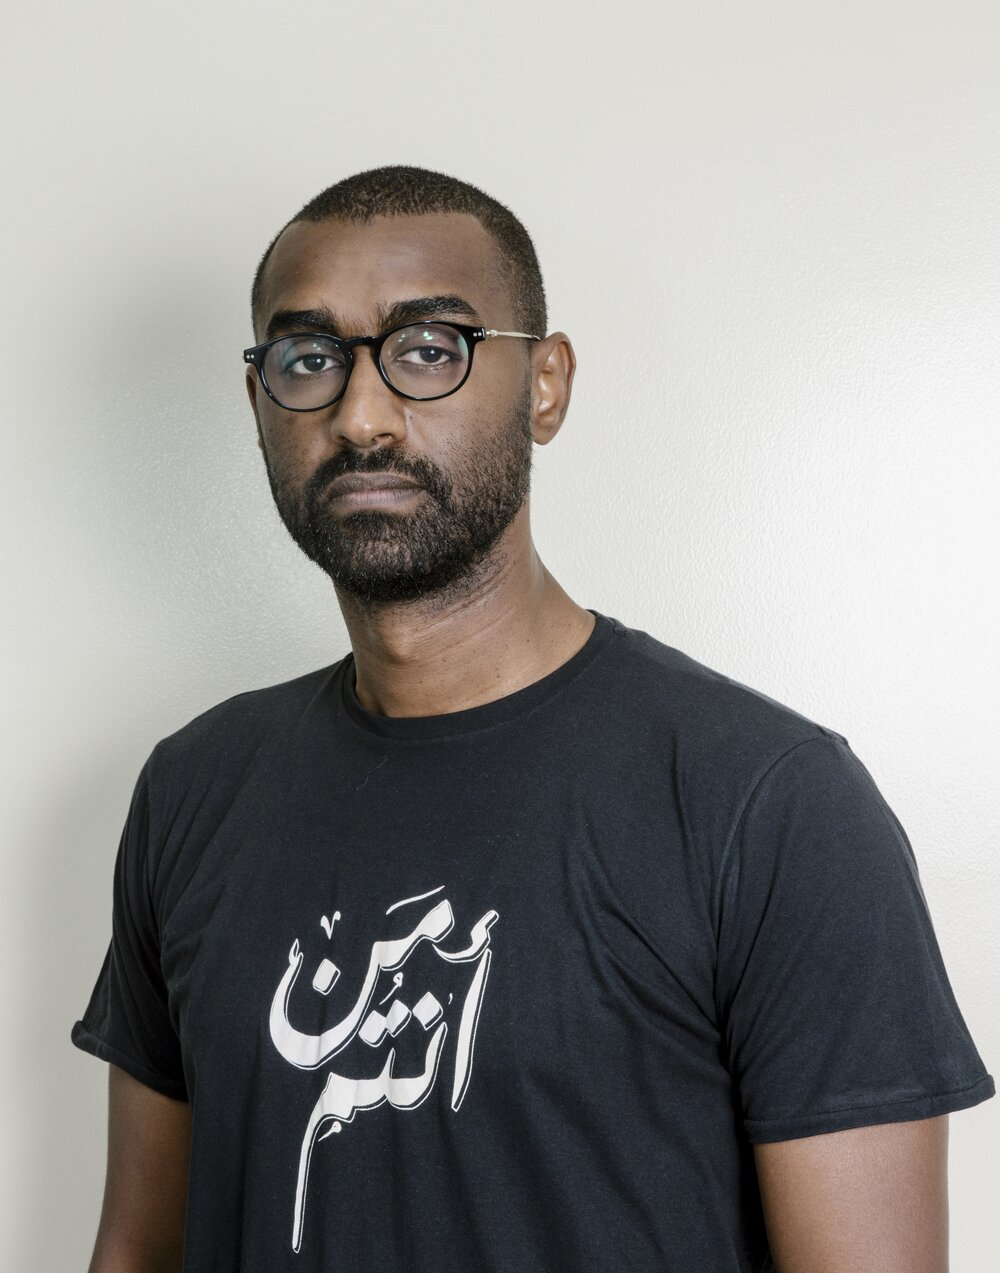 015 Khalid Albaih: How we lost the internet